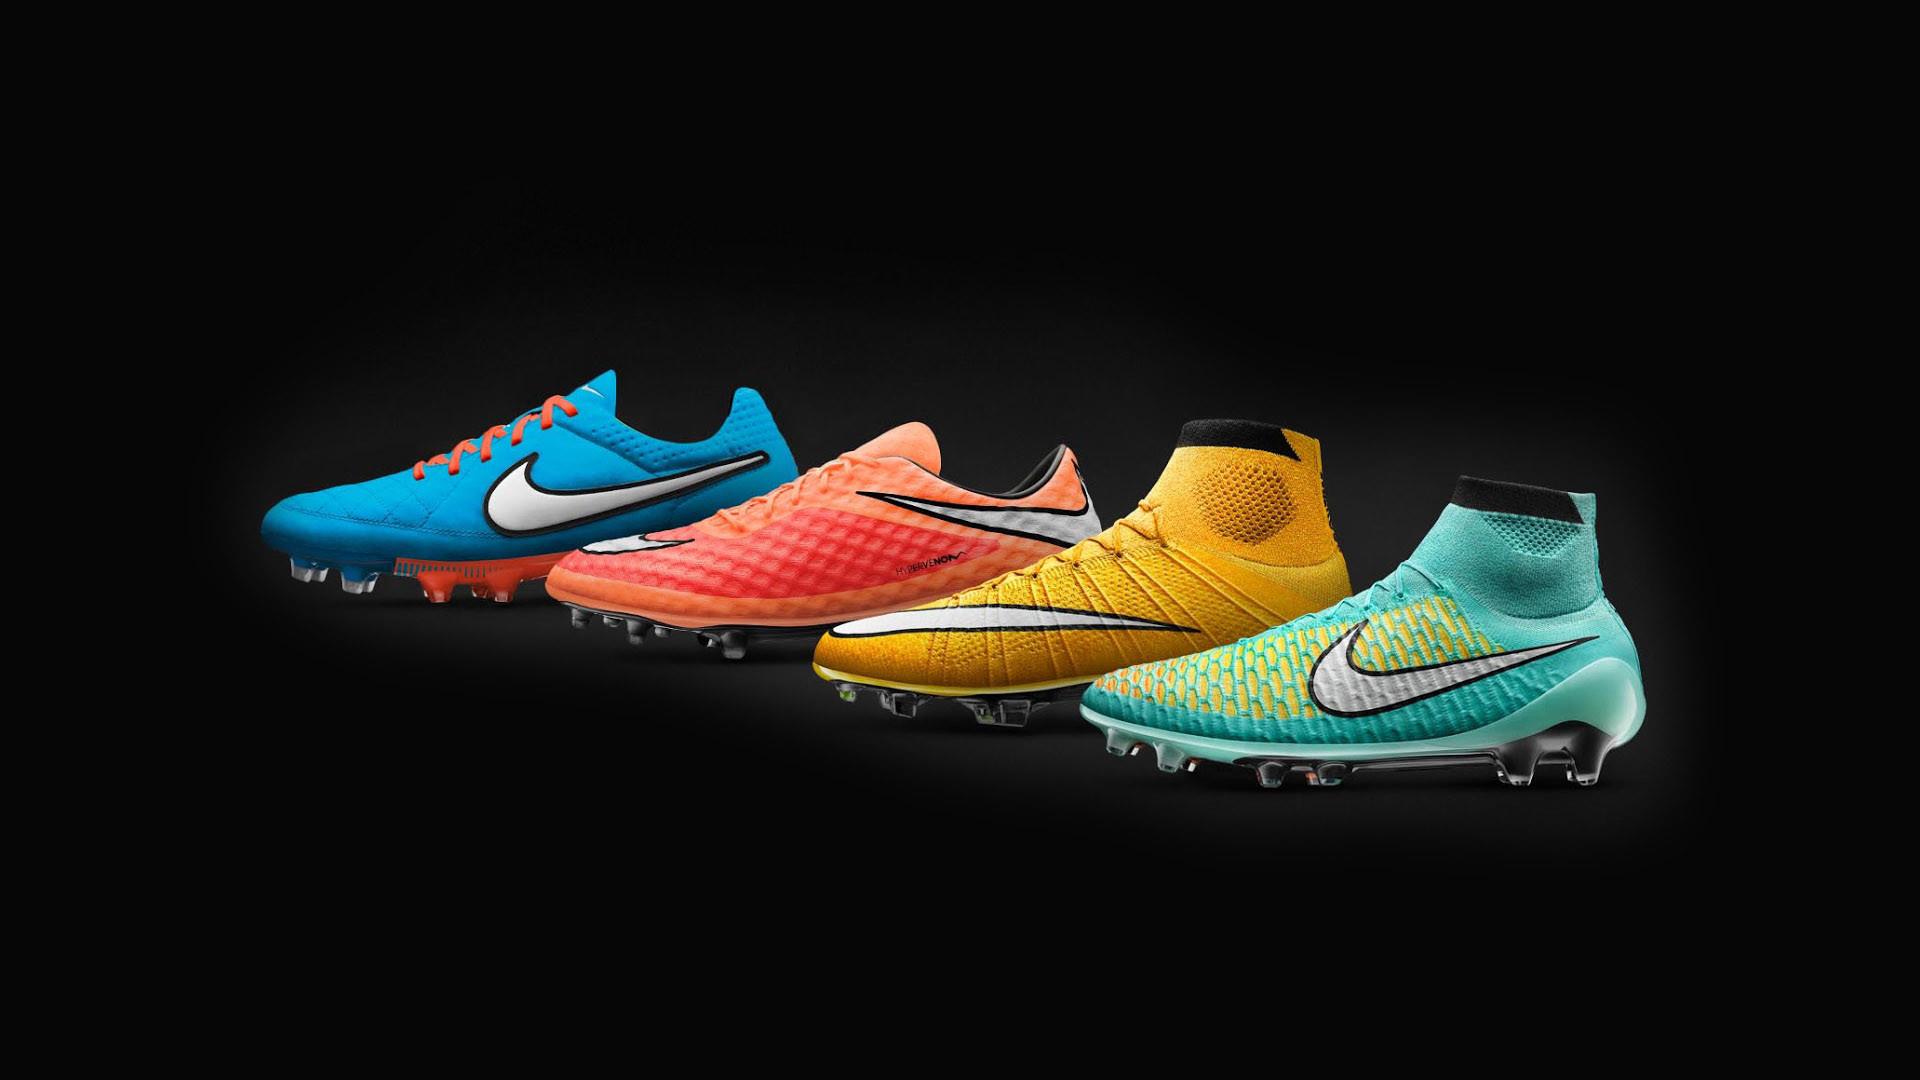 Nike Football Wallpaper Hd Wallpapersafari